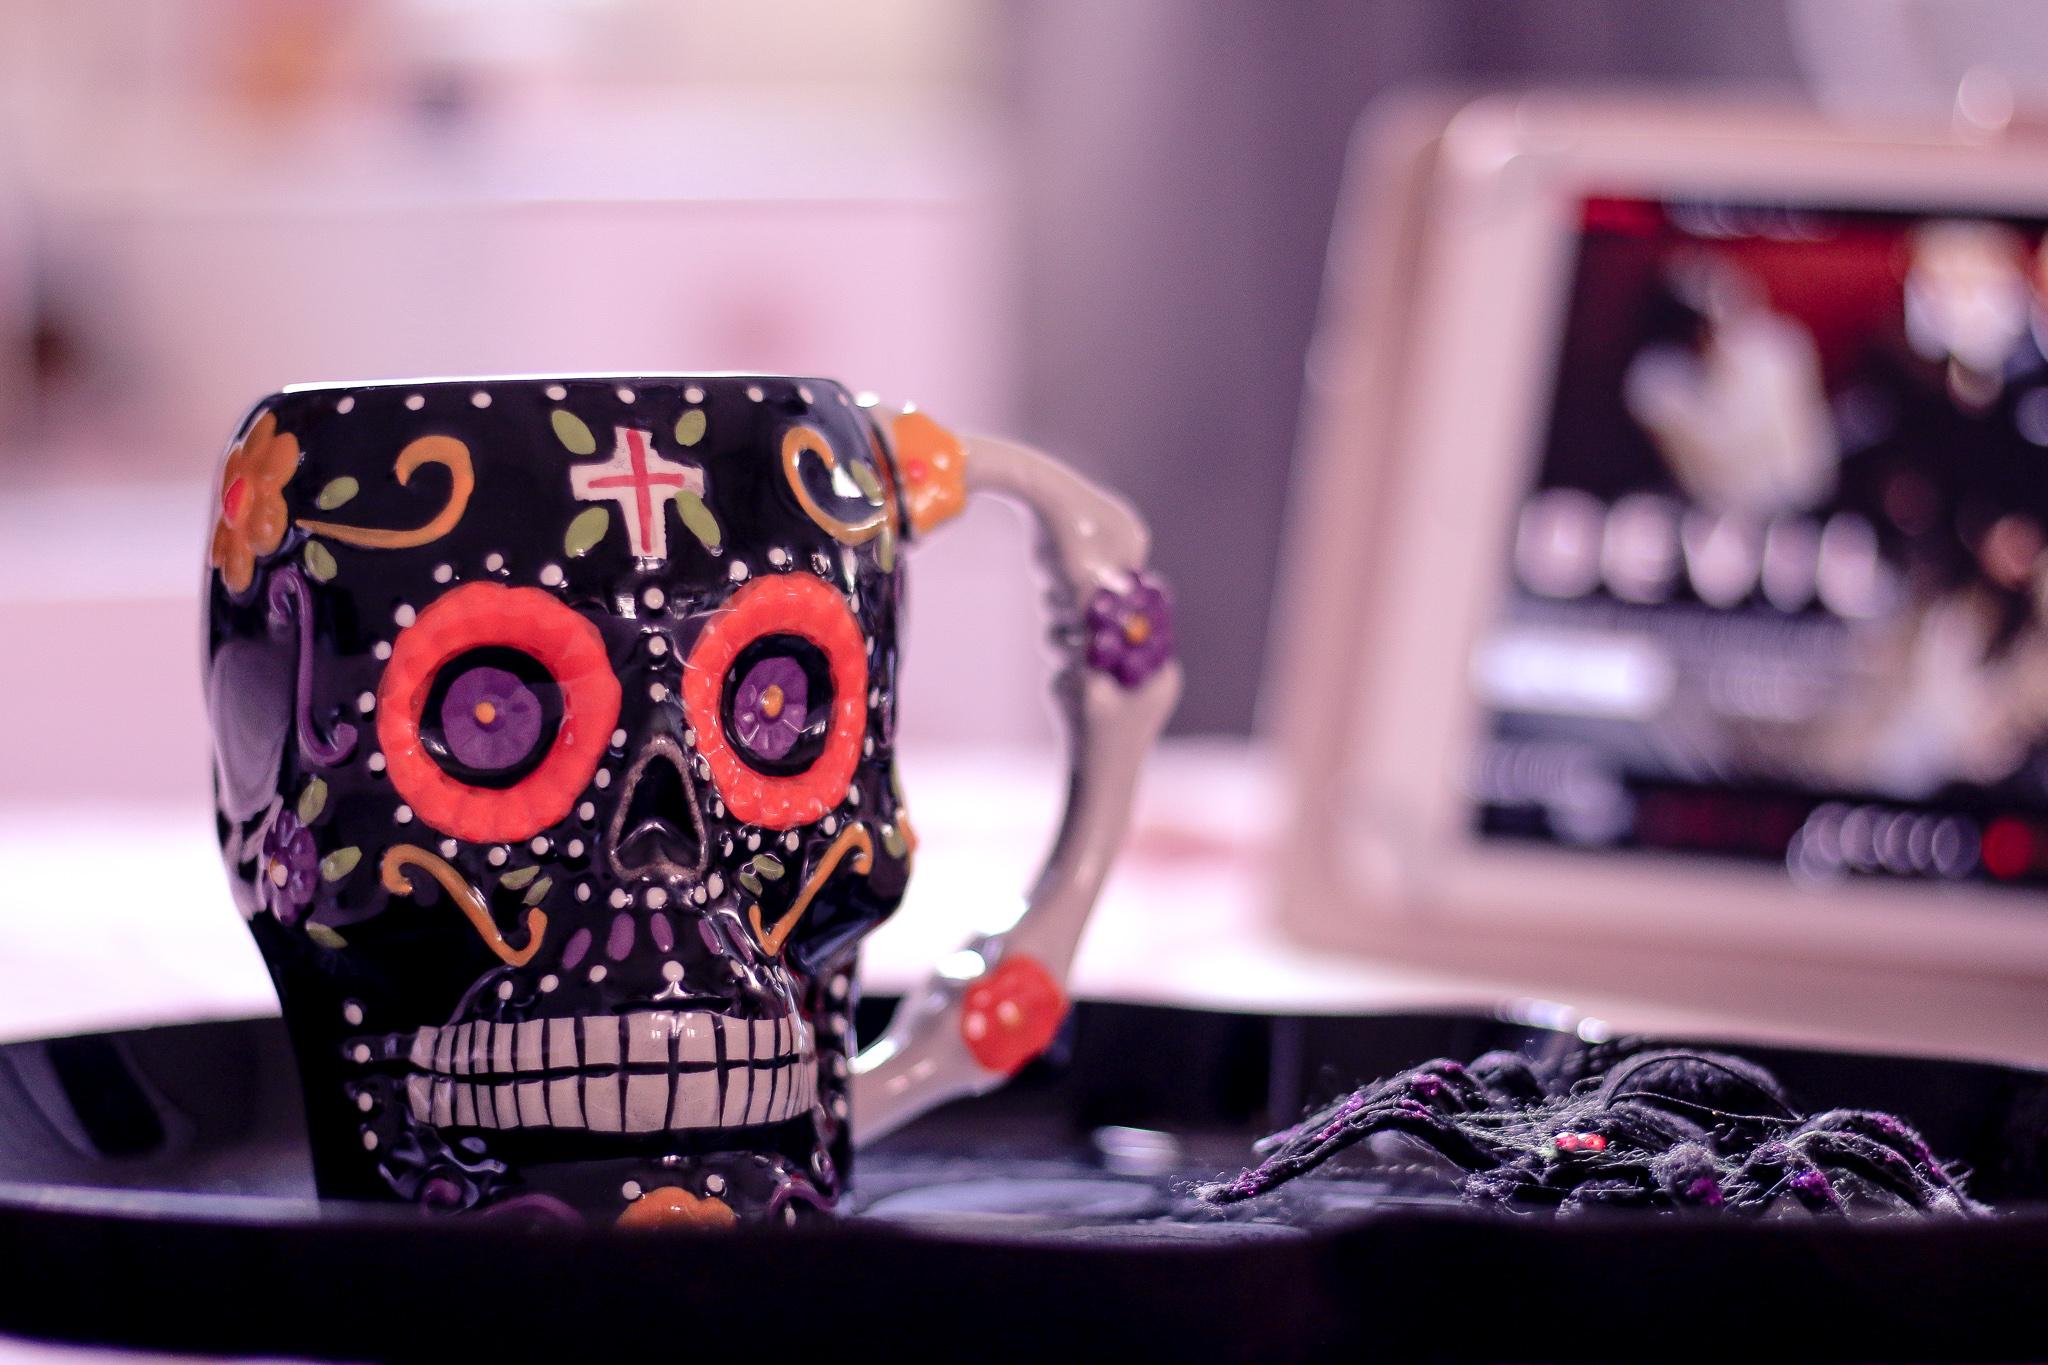 Close up photo of a black and orange sugar skull mug